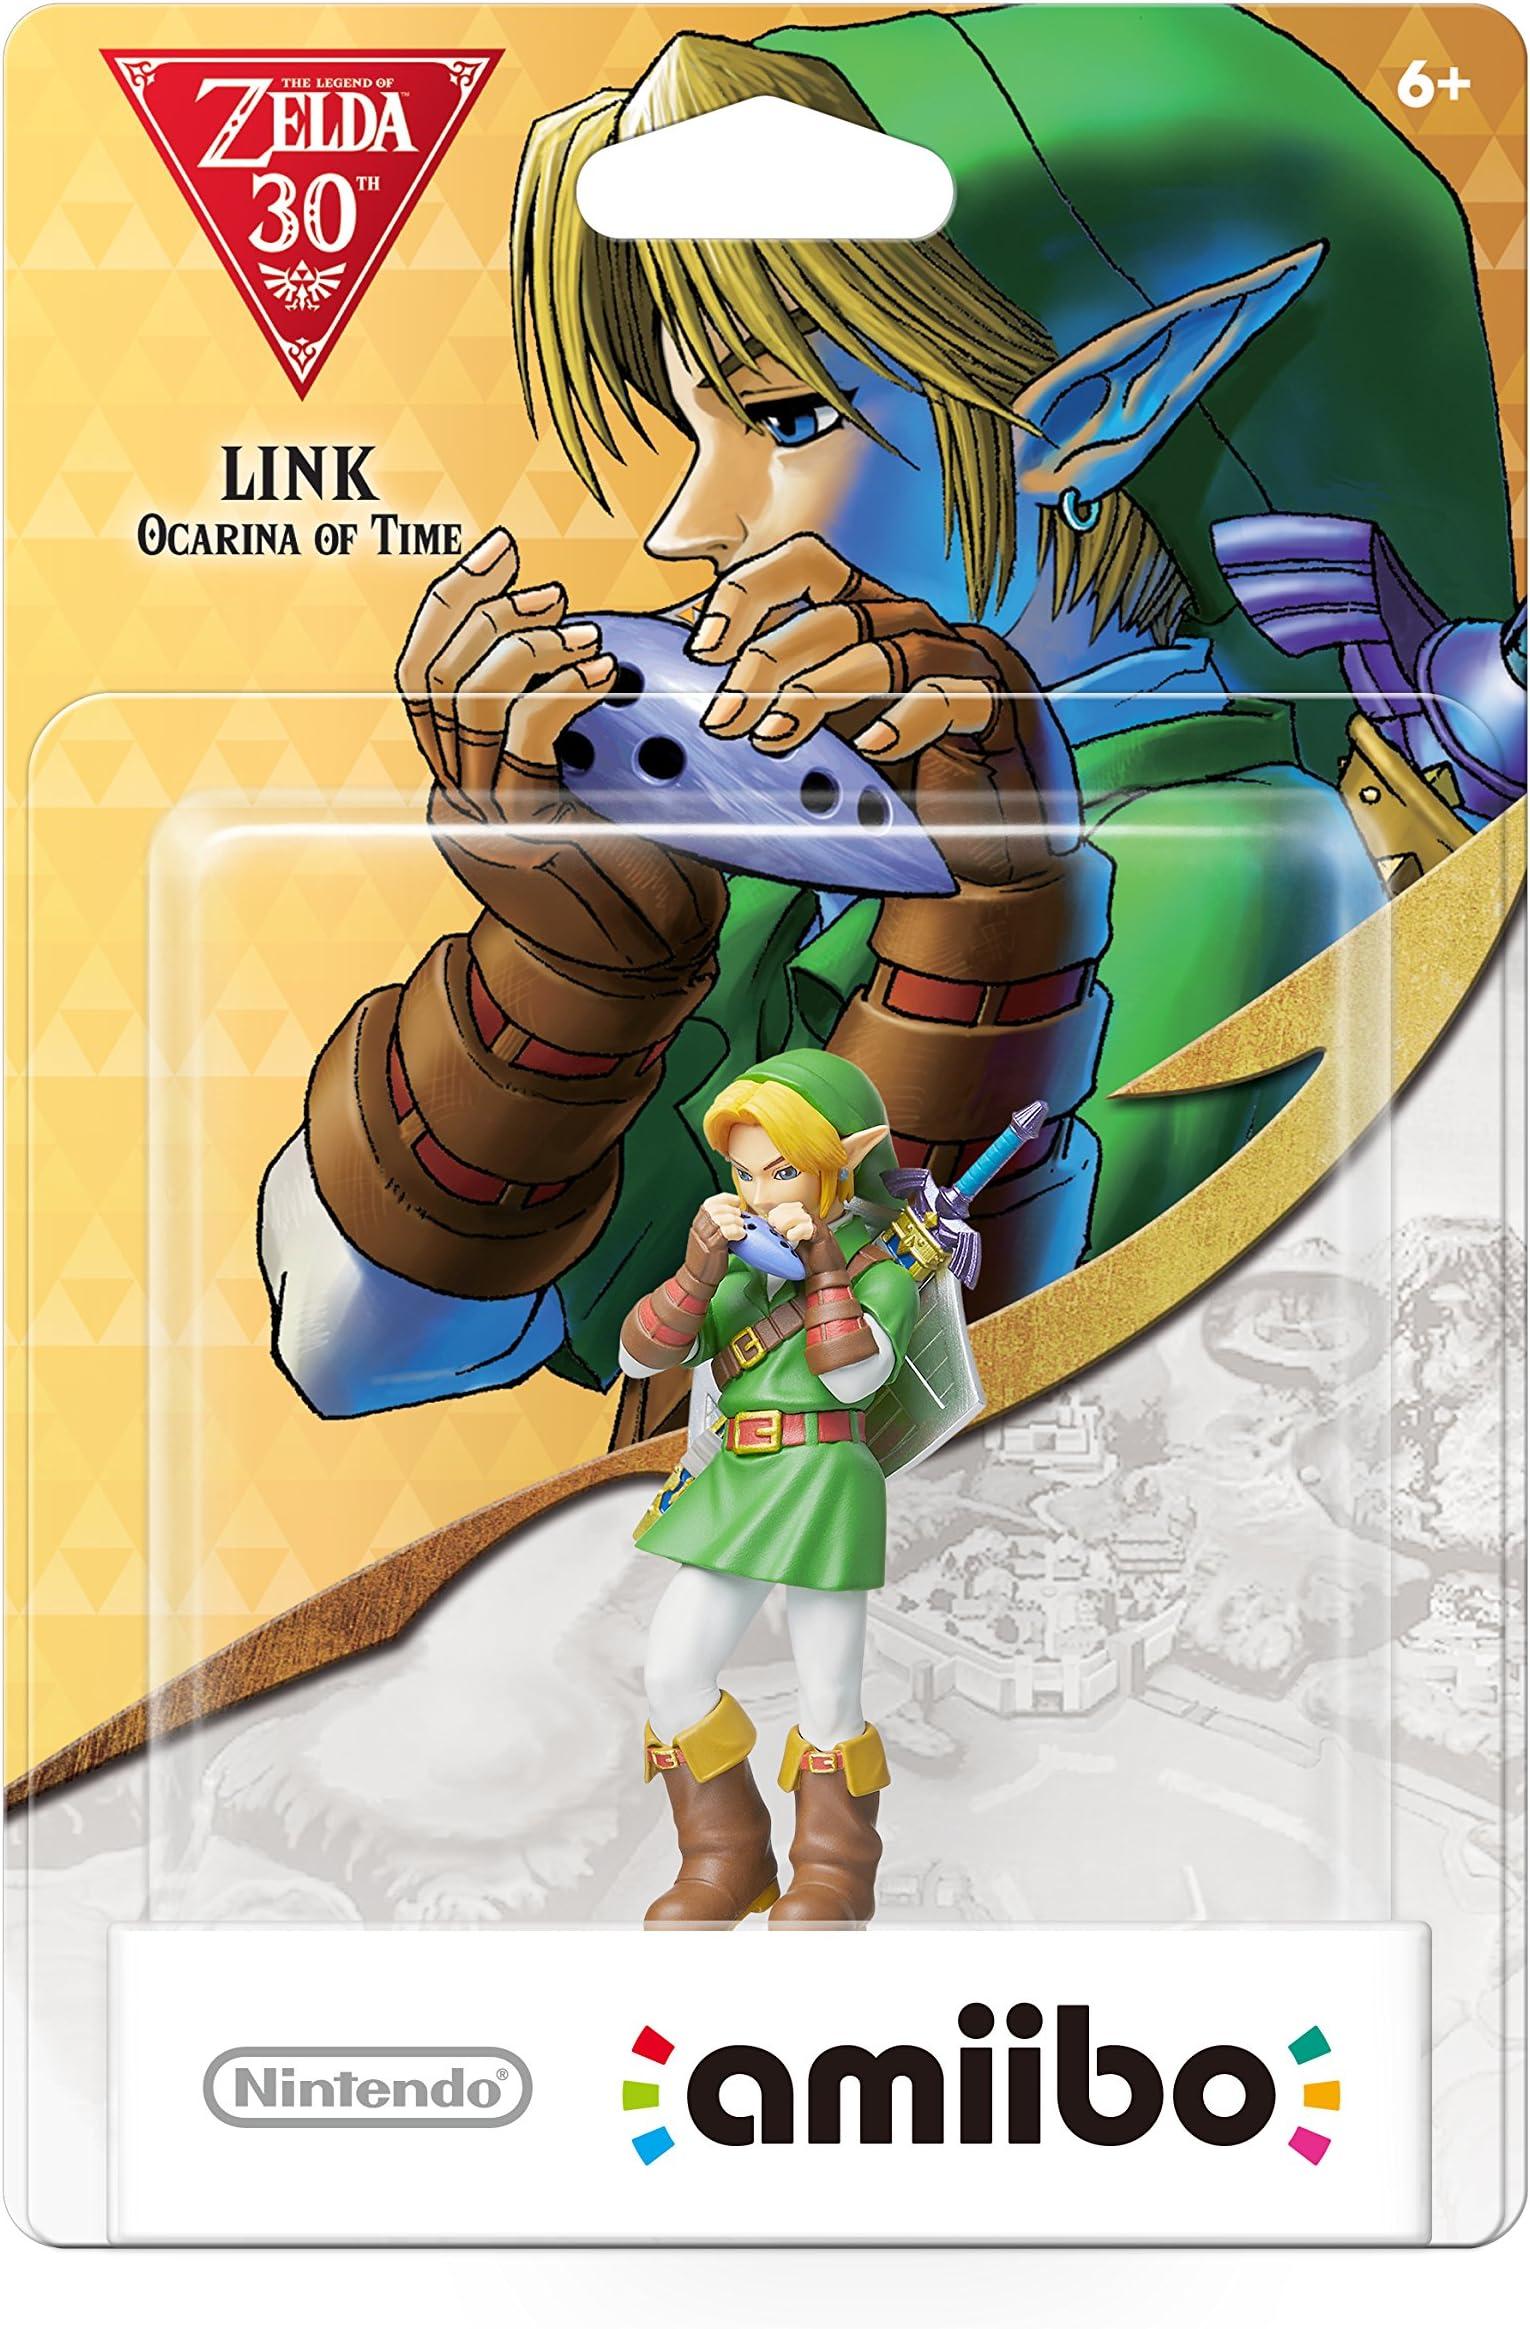 Amazon.com: Nintendo Link: Ocarina of Time amiibo - Nintendo ...